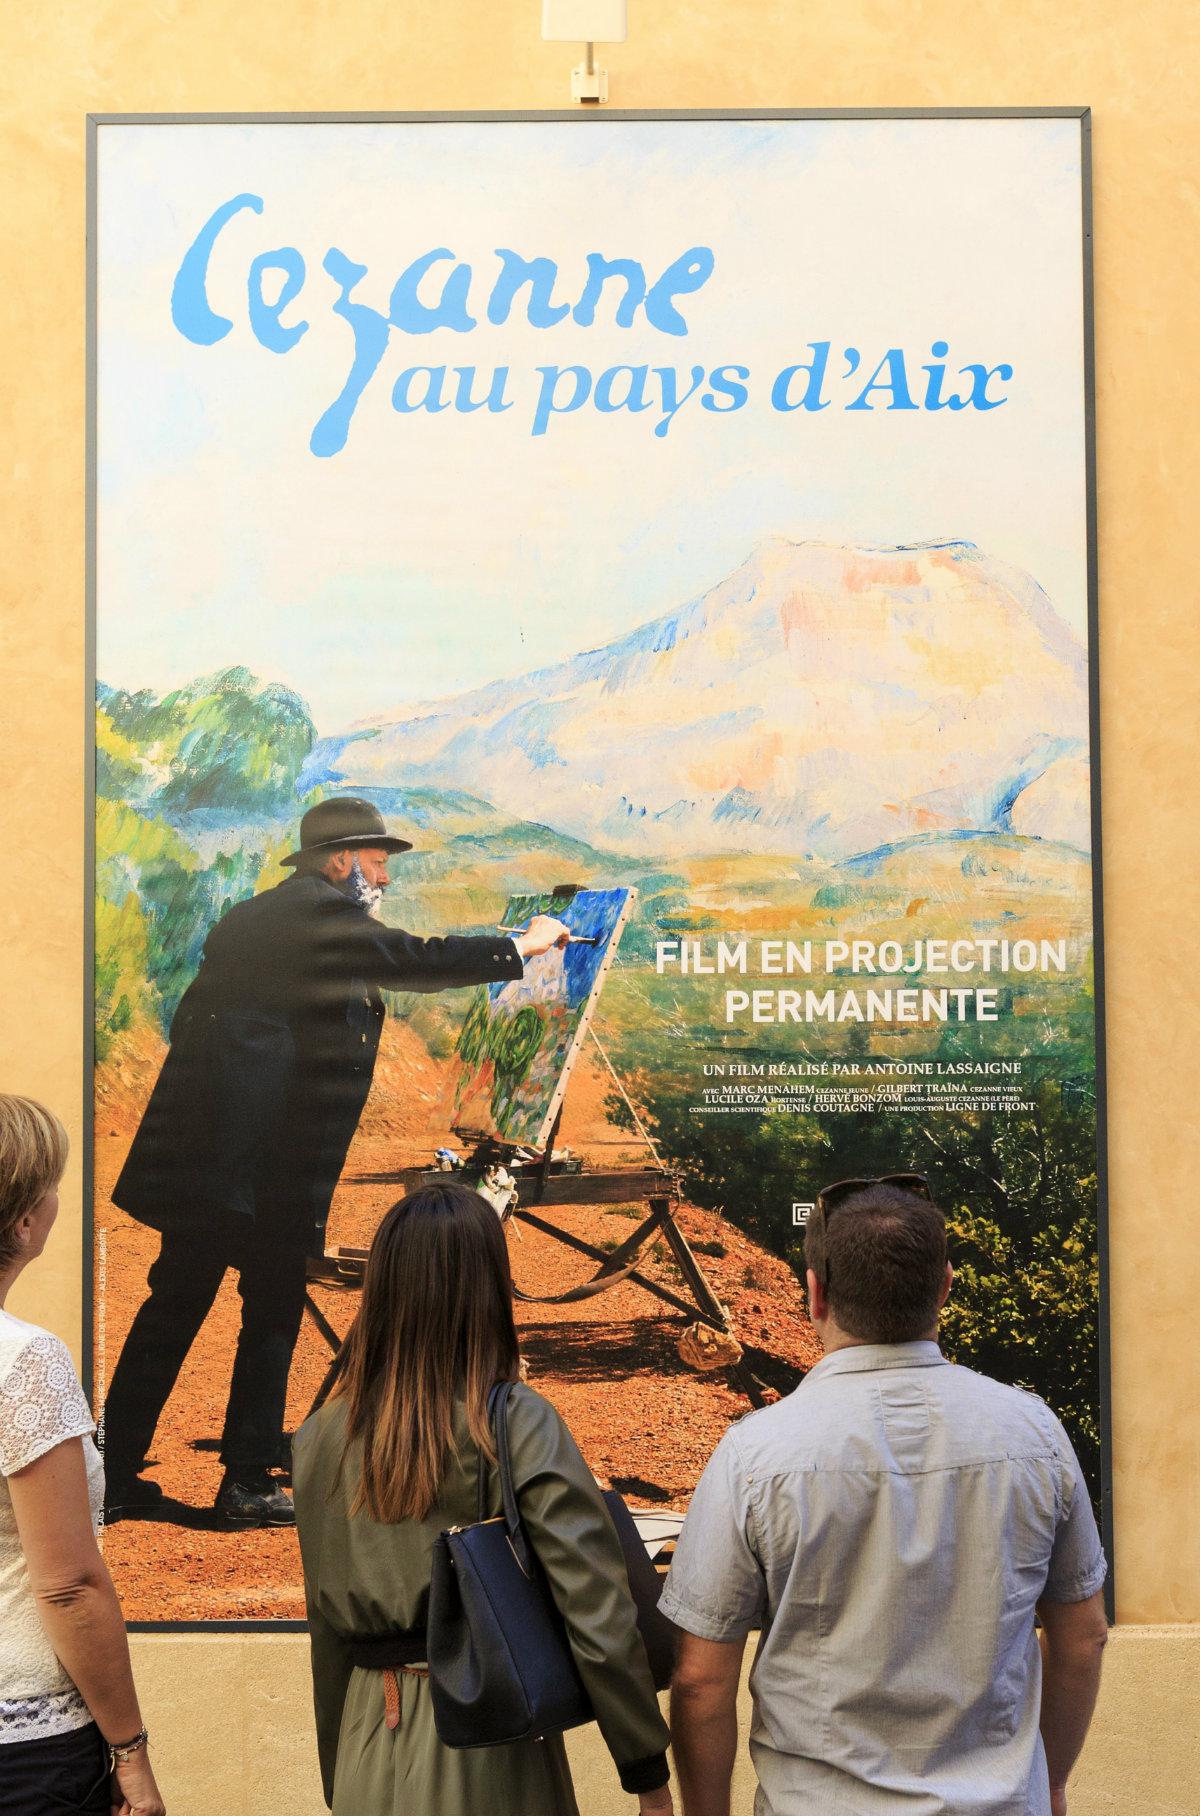 Cezanne affiche